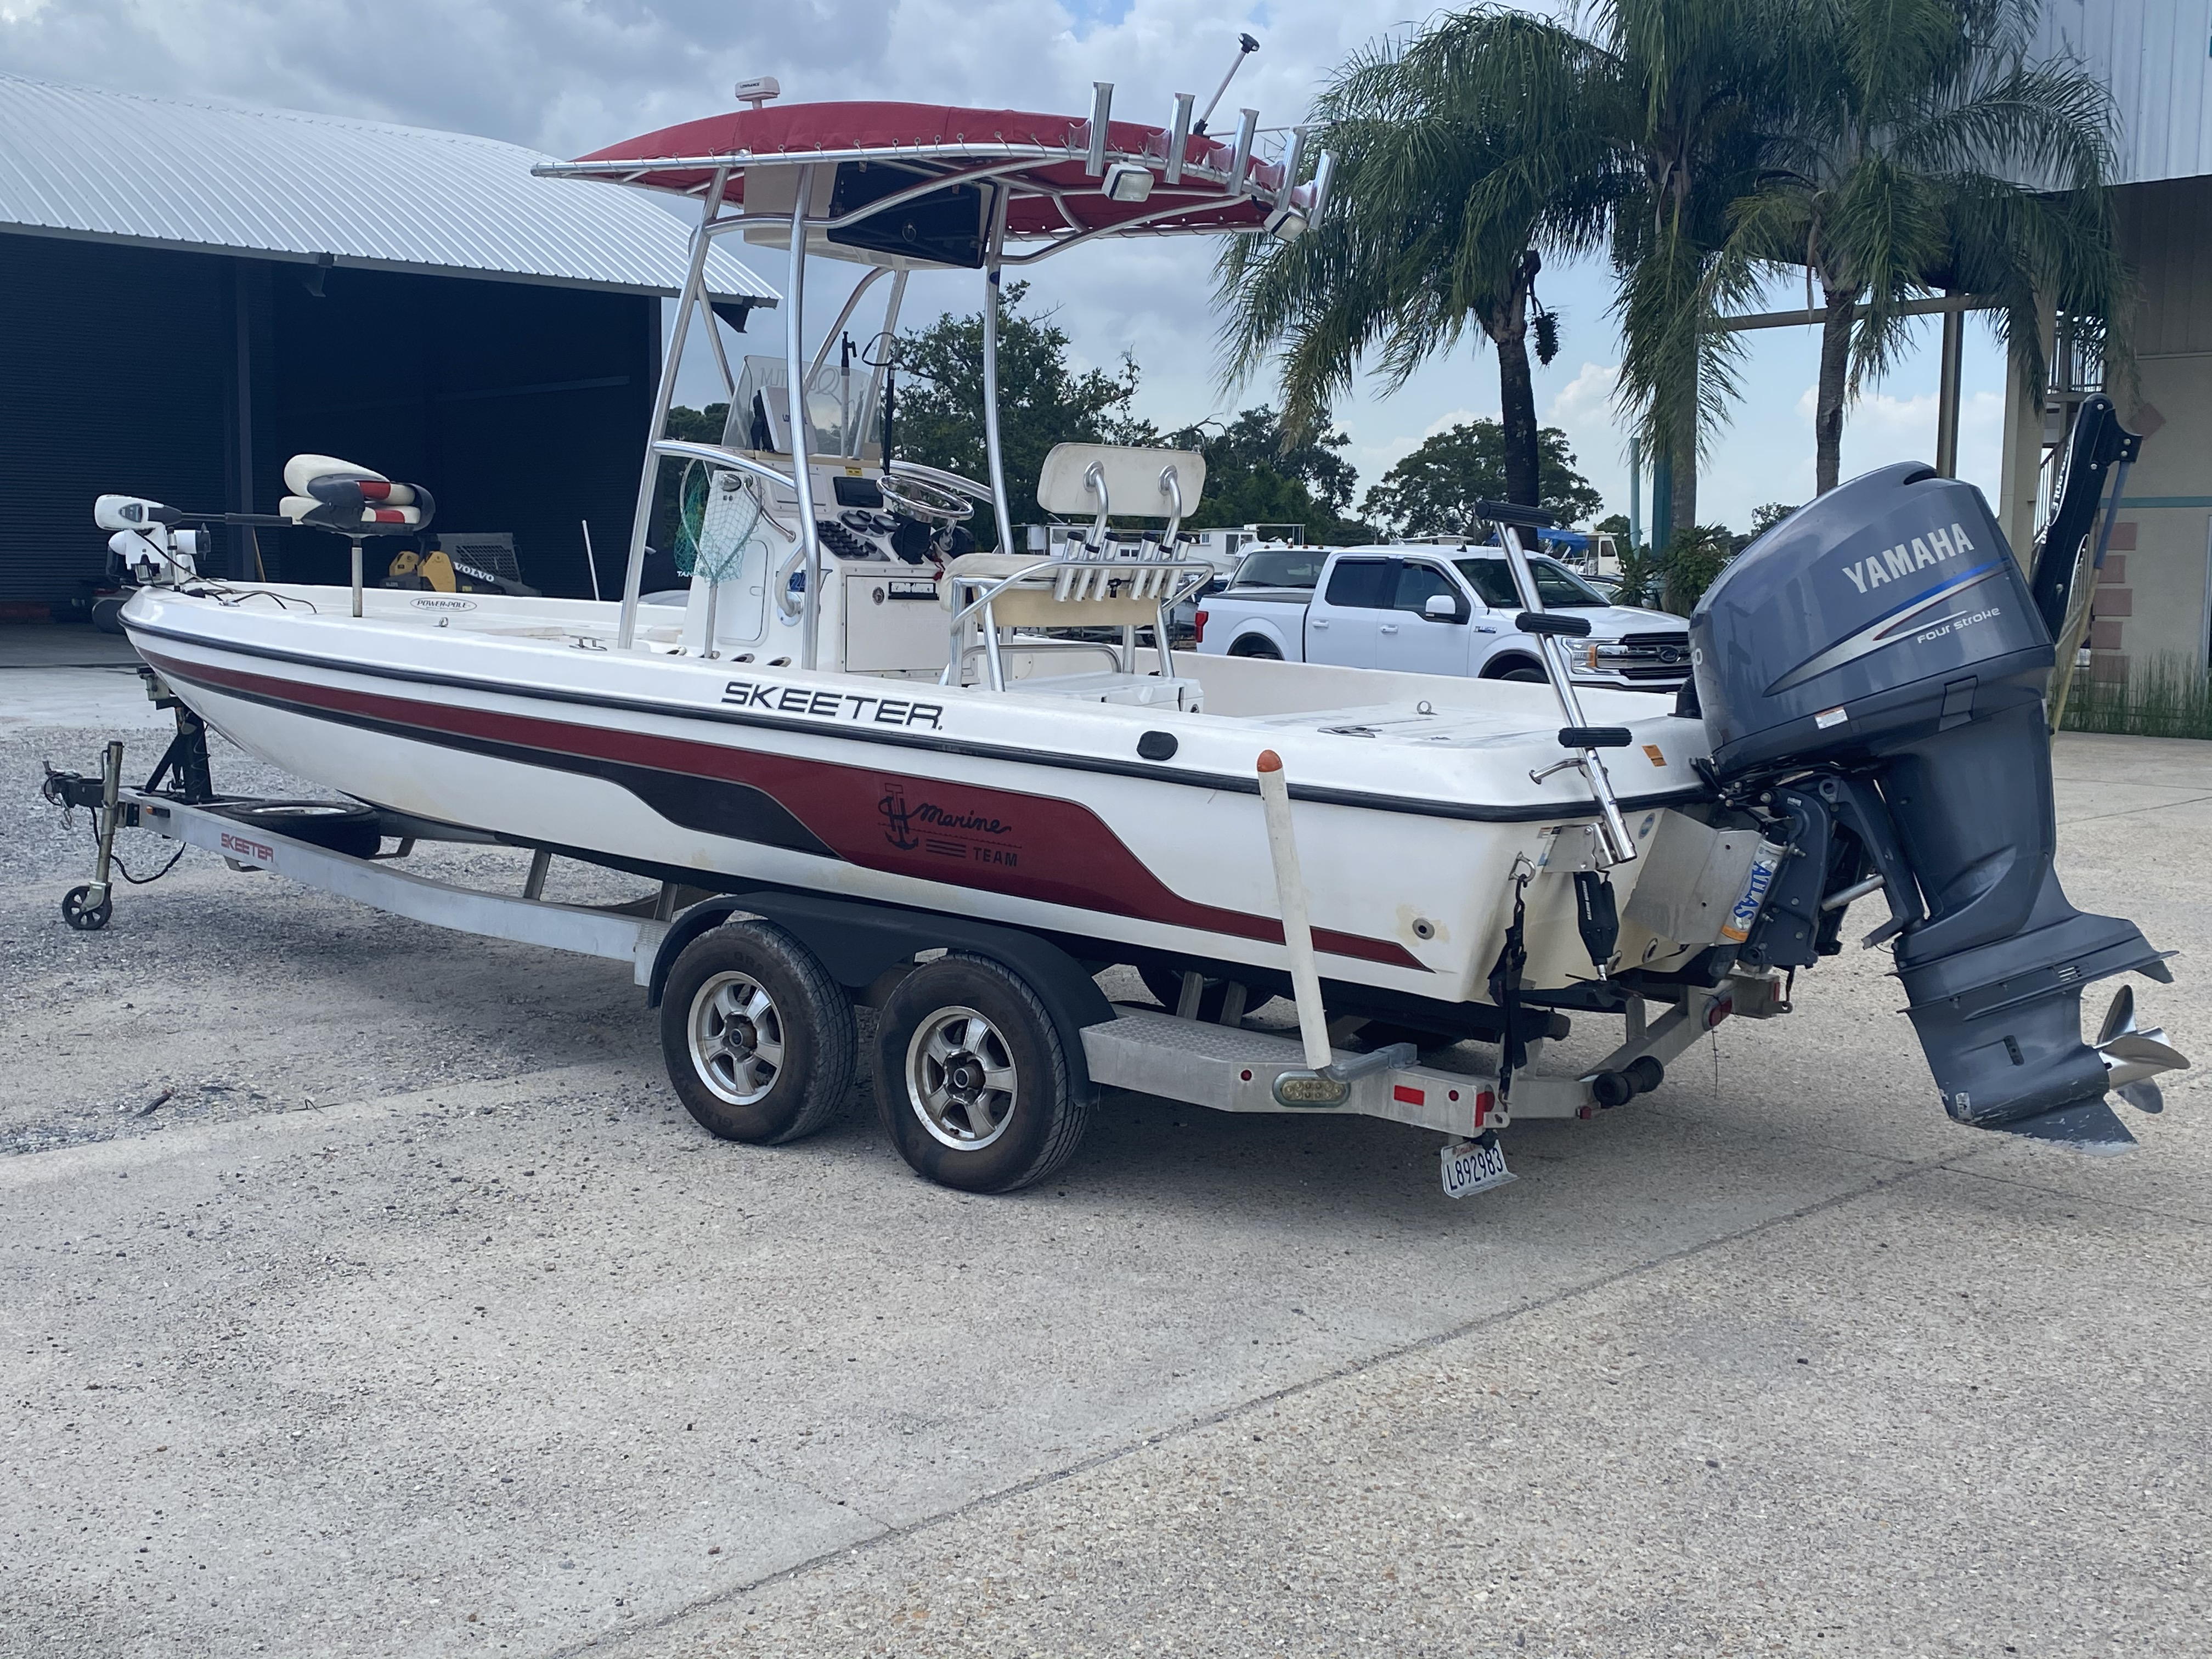 2010 Skeeter boat for sale, model of the boat is ZX24V & Image # 2 of 16